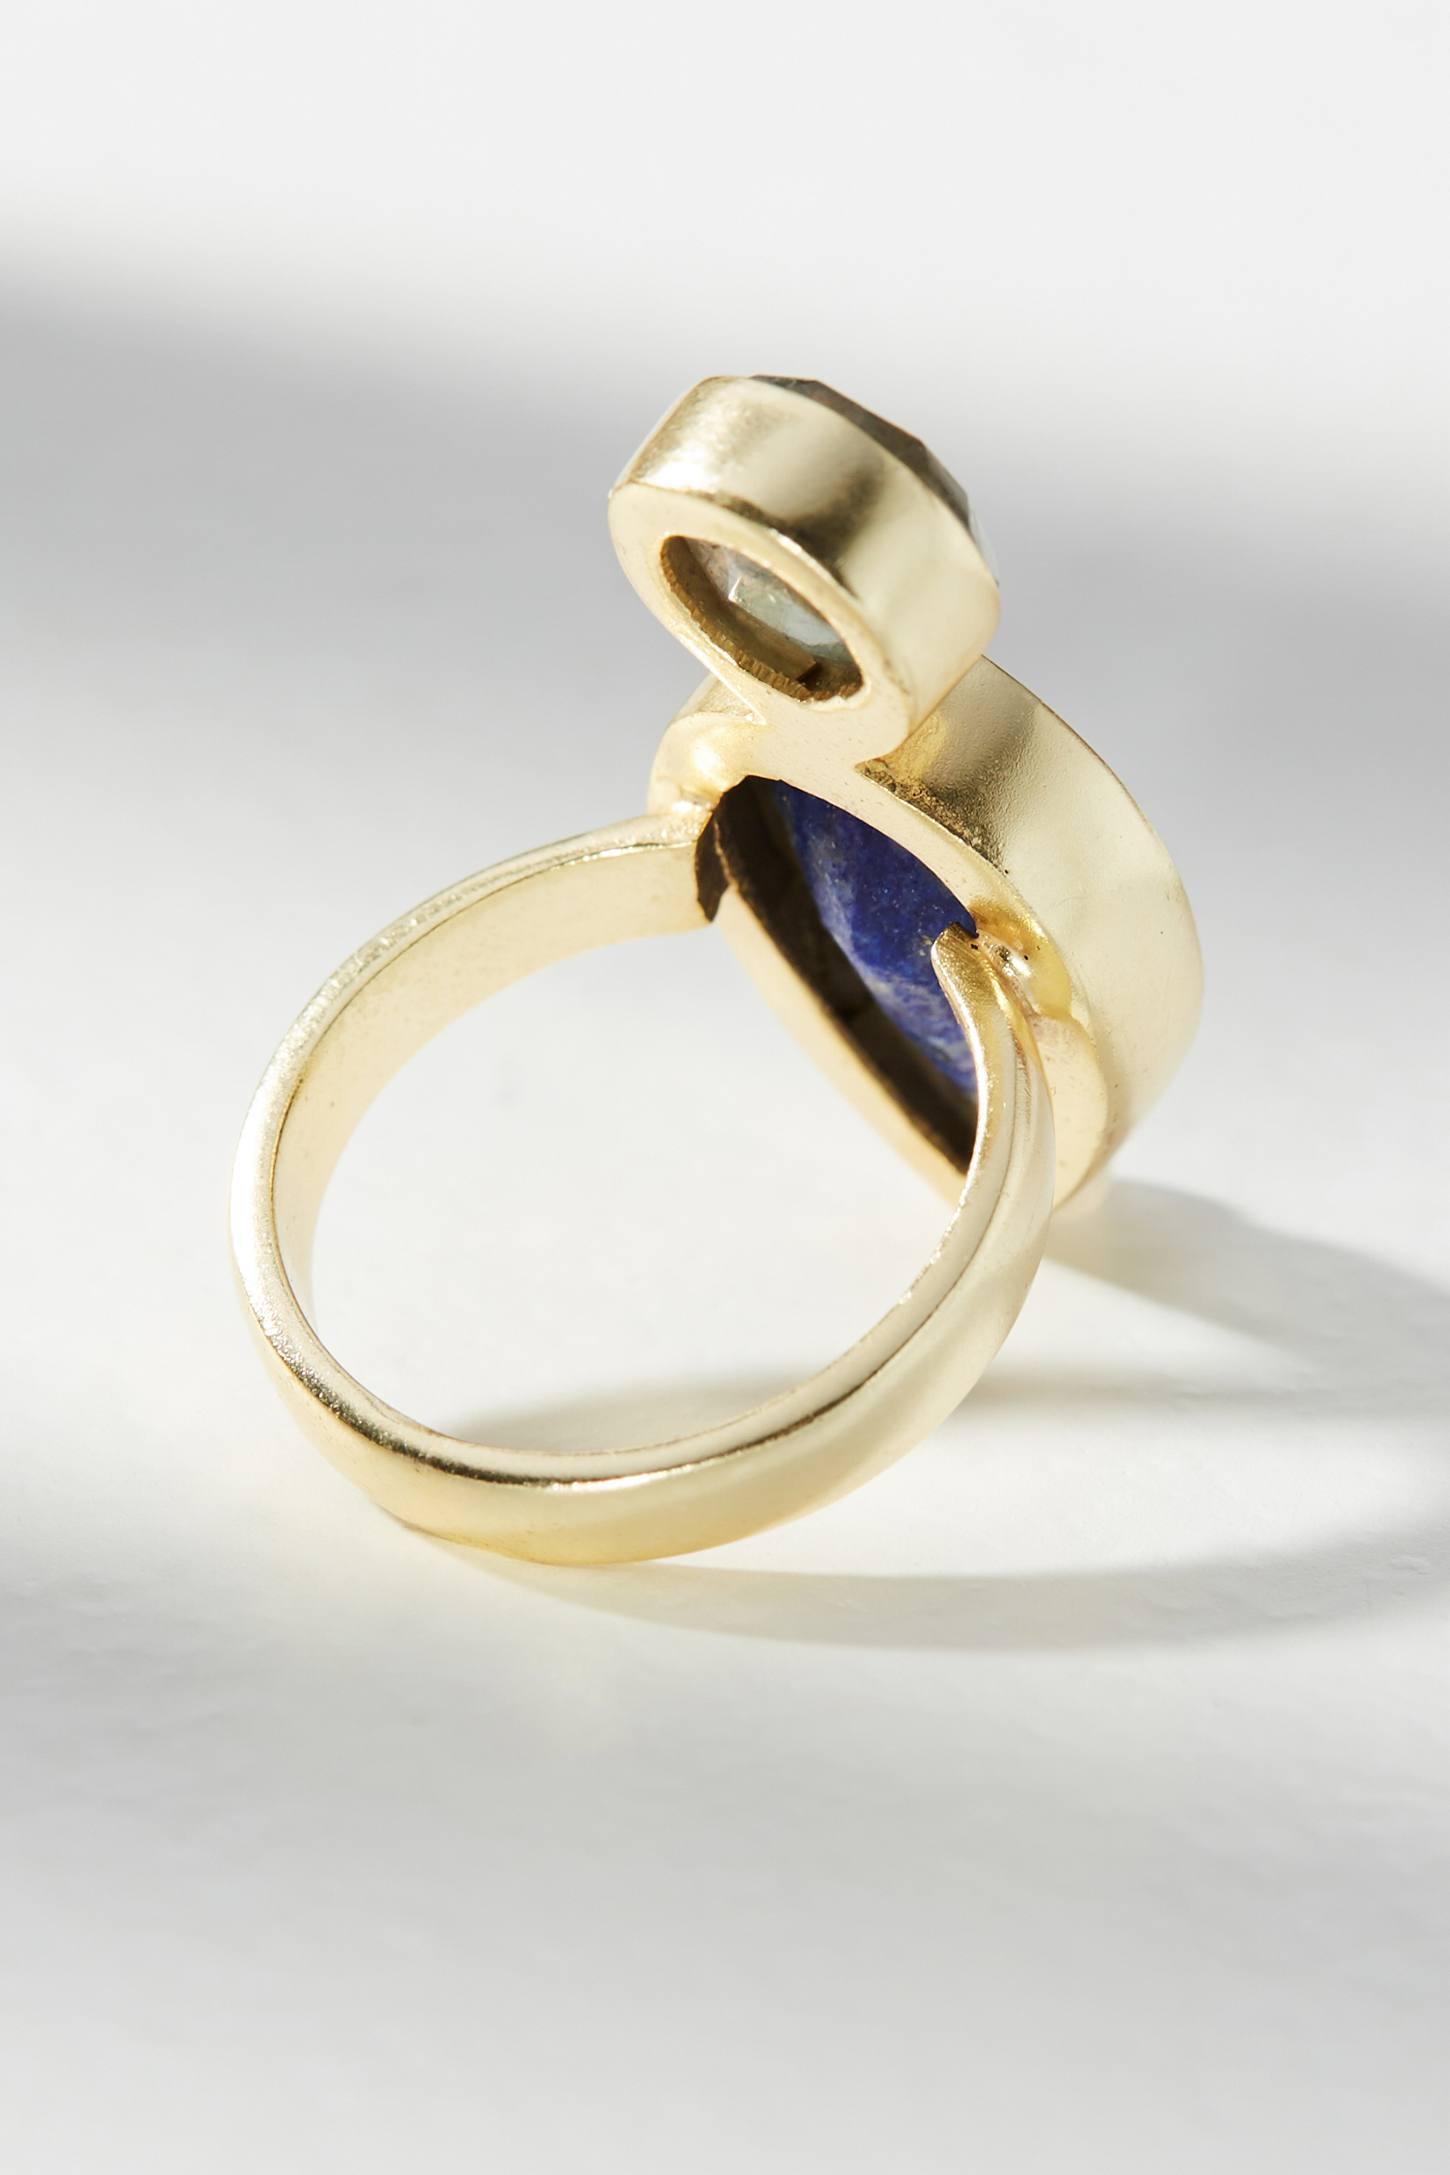 Kanupriya Ocean Stone Ring m1Chr